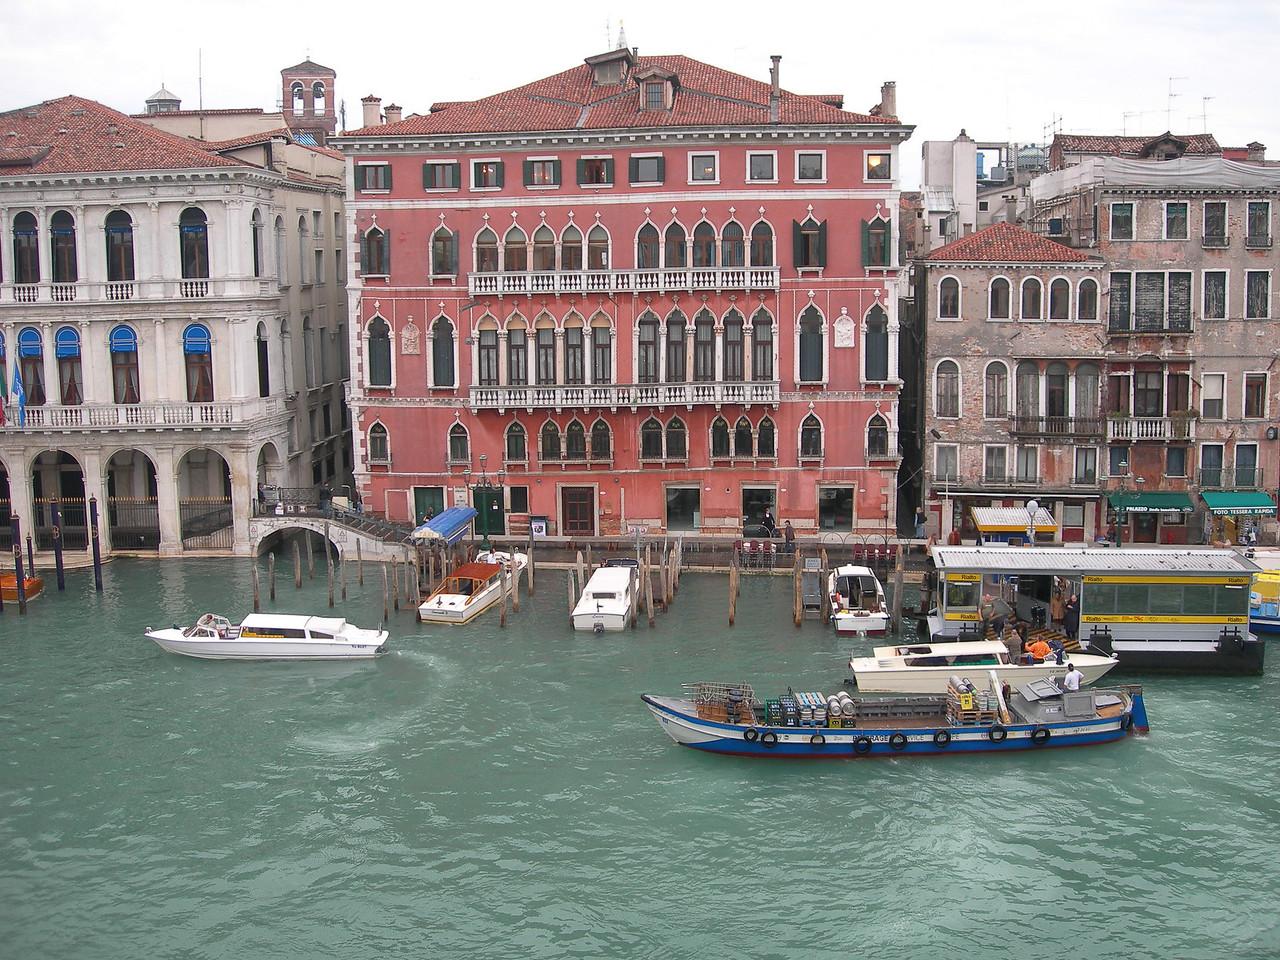 Venice hotel view - straight